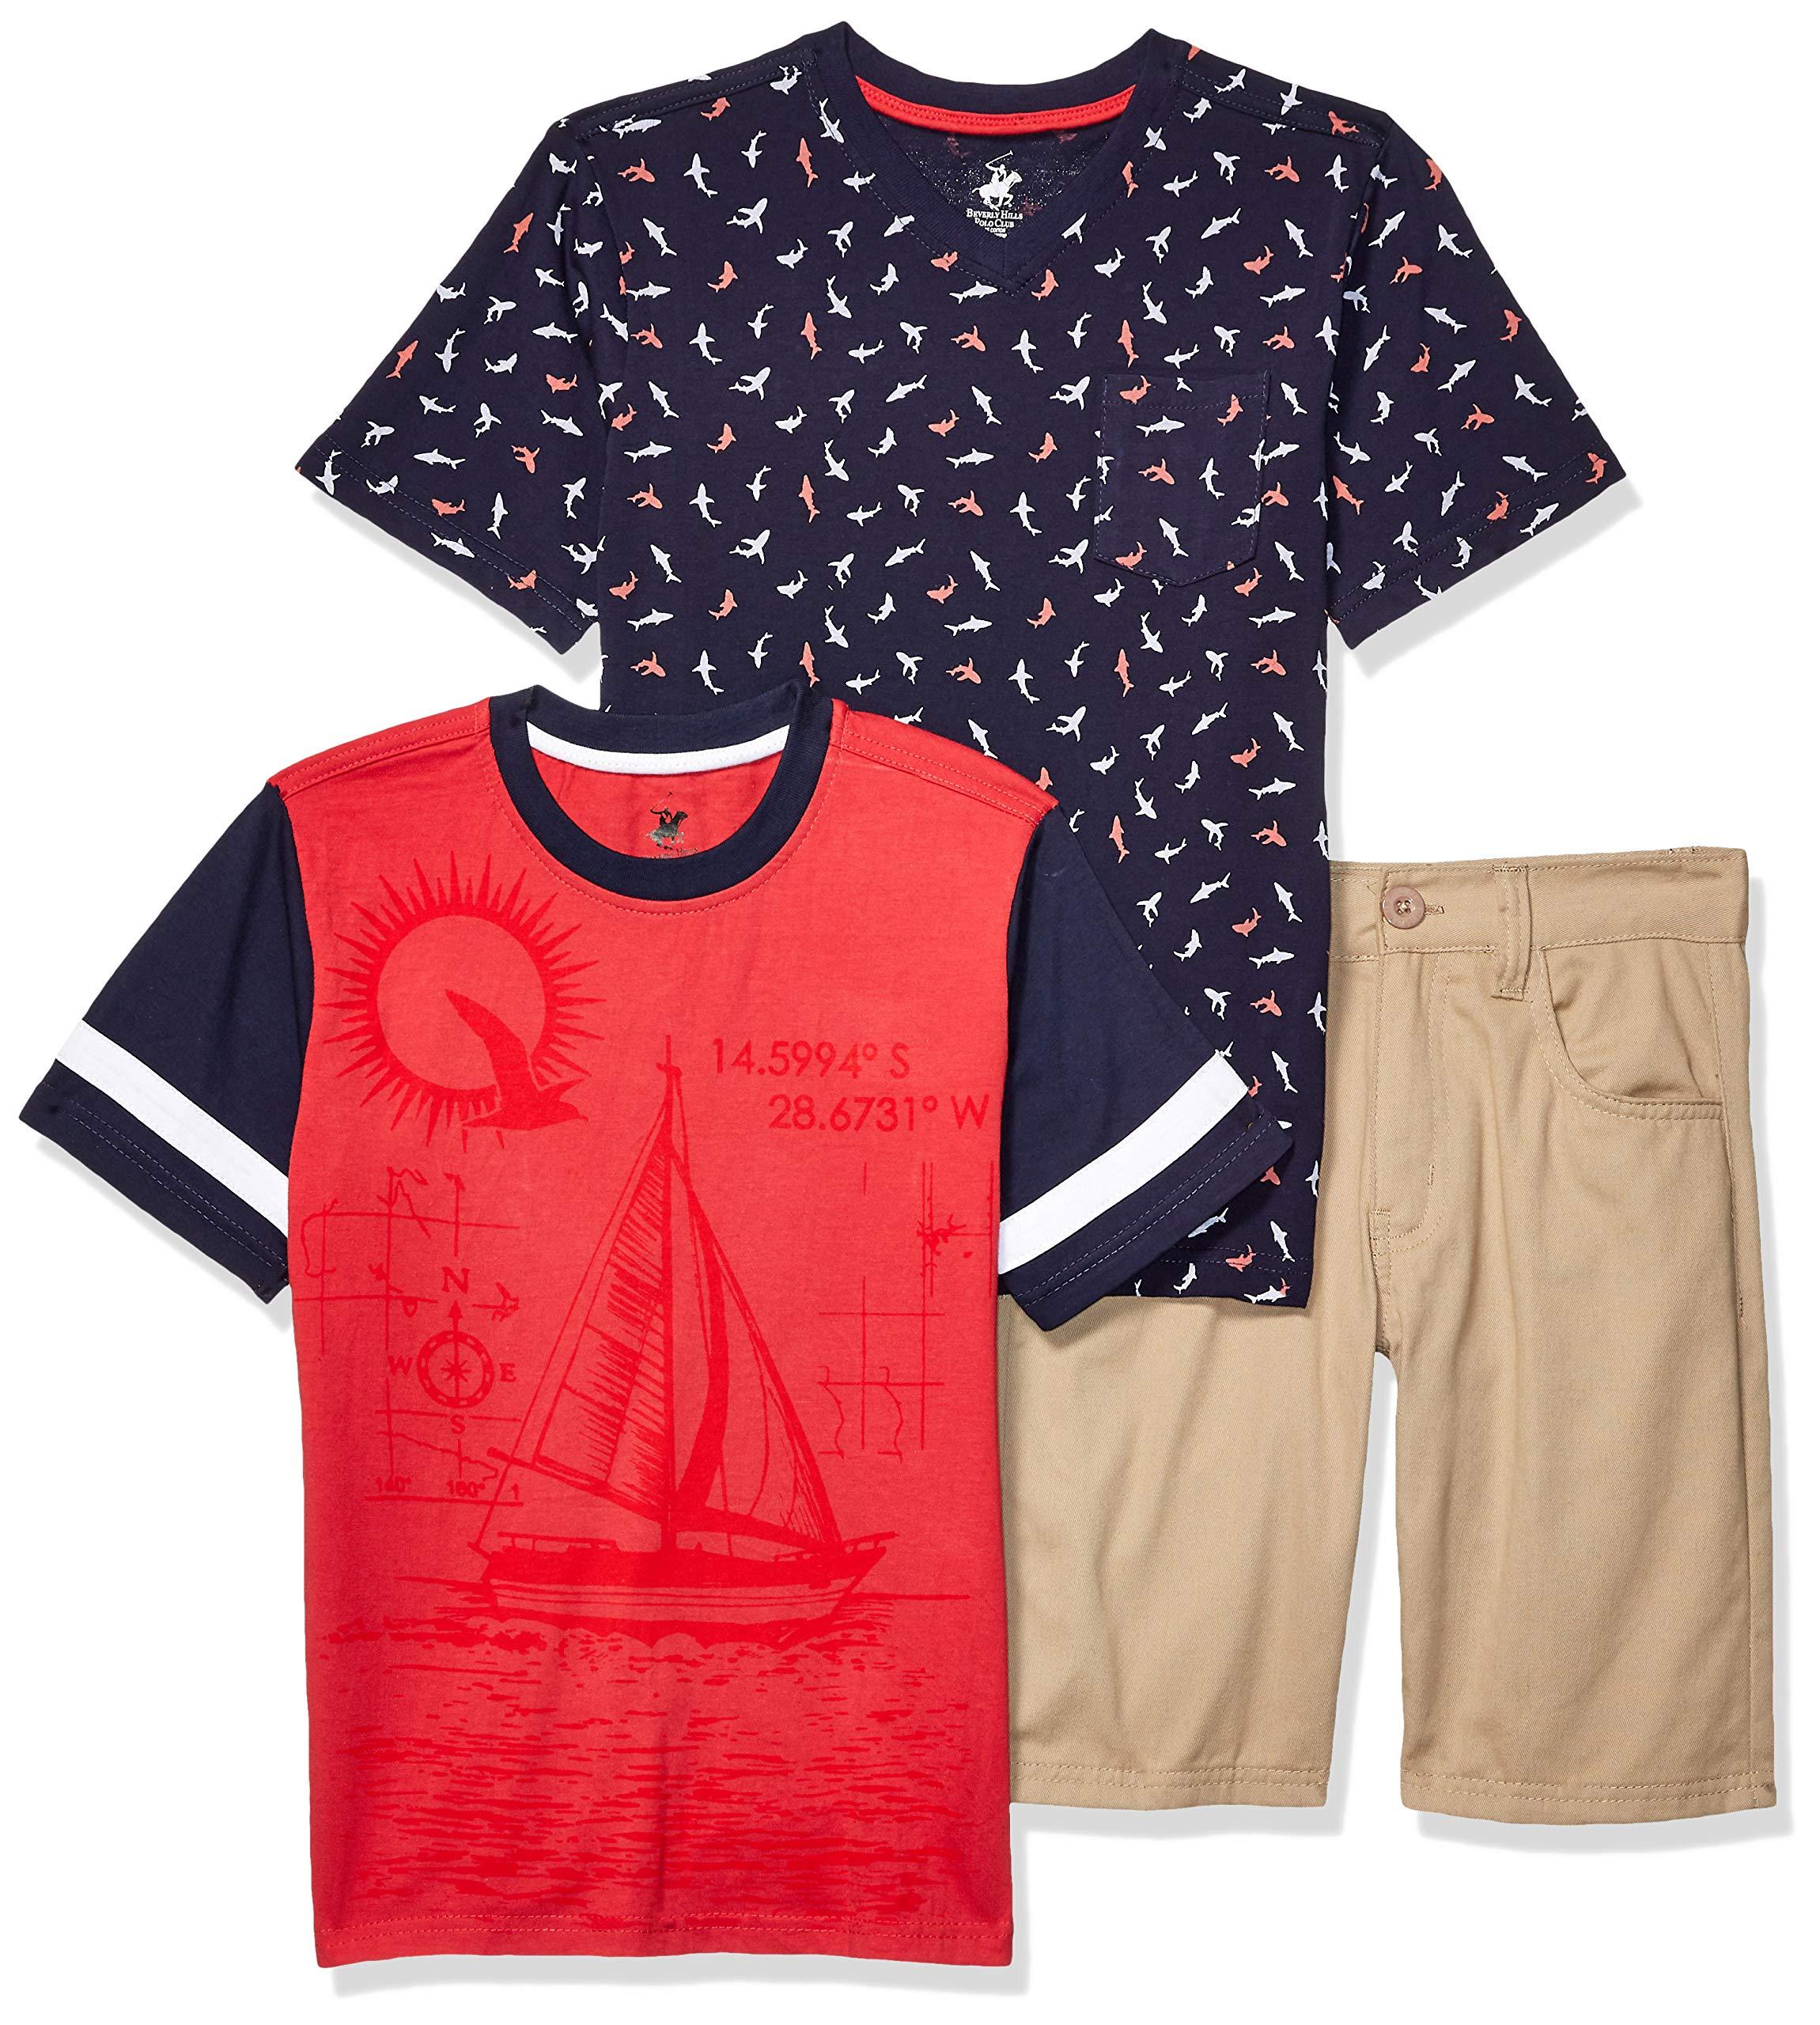 Beverly Hills Polo Club Boys' Big 3 Piece Short Set, Light red Sailboat, 8